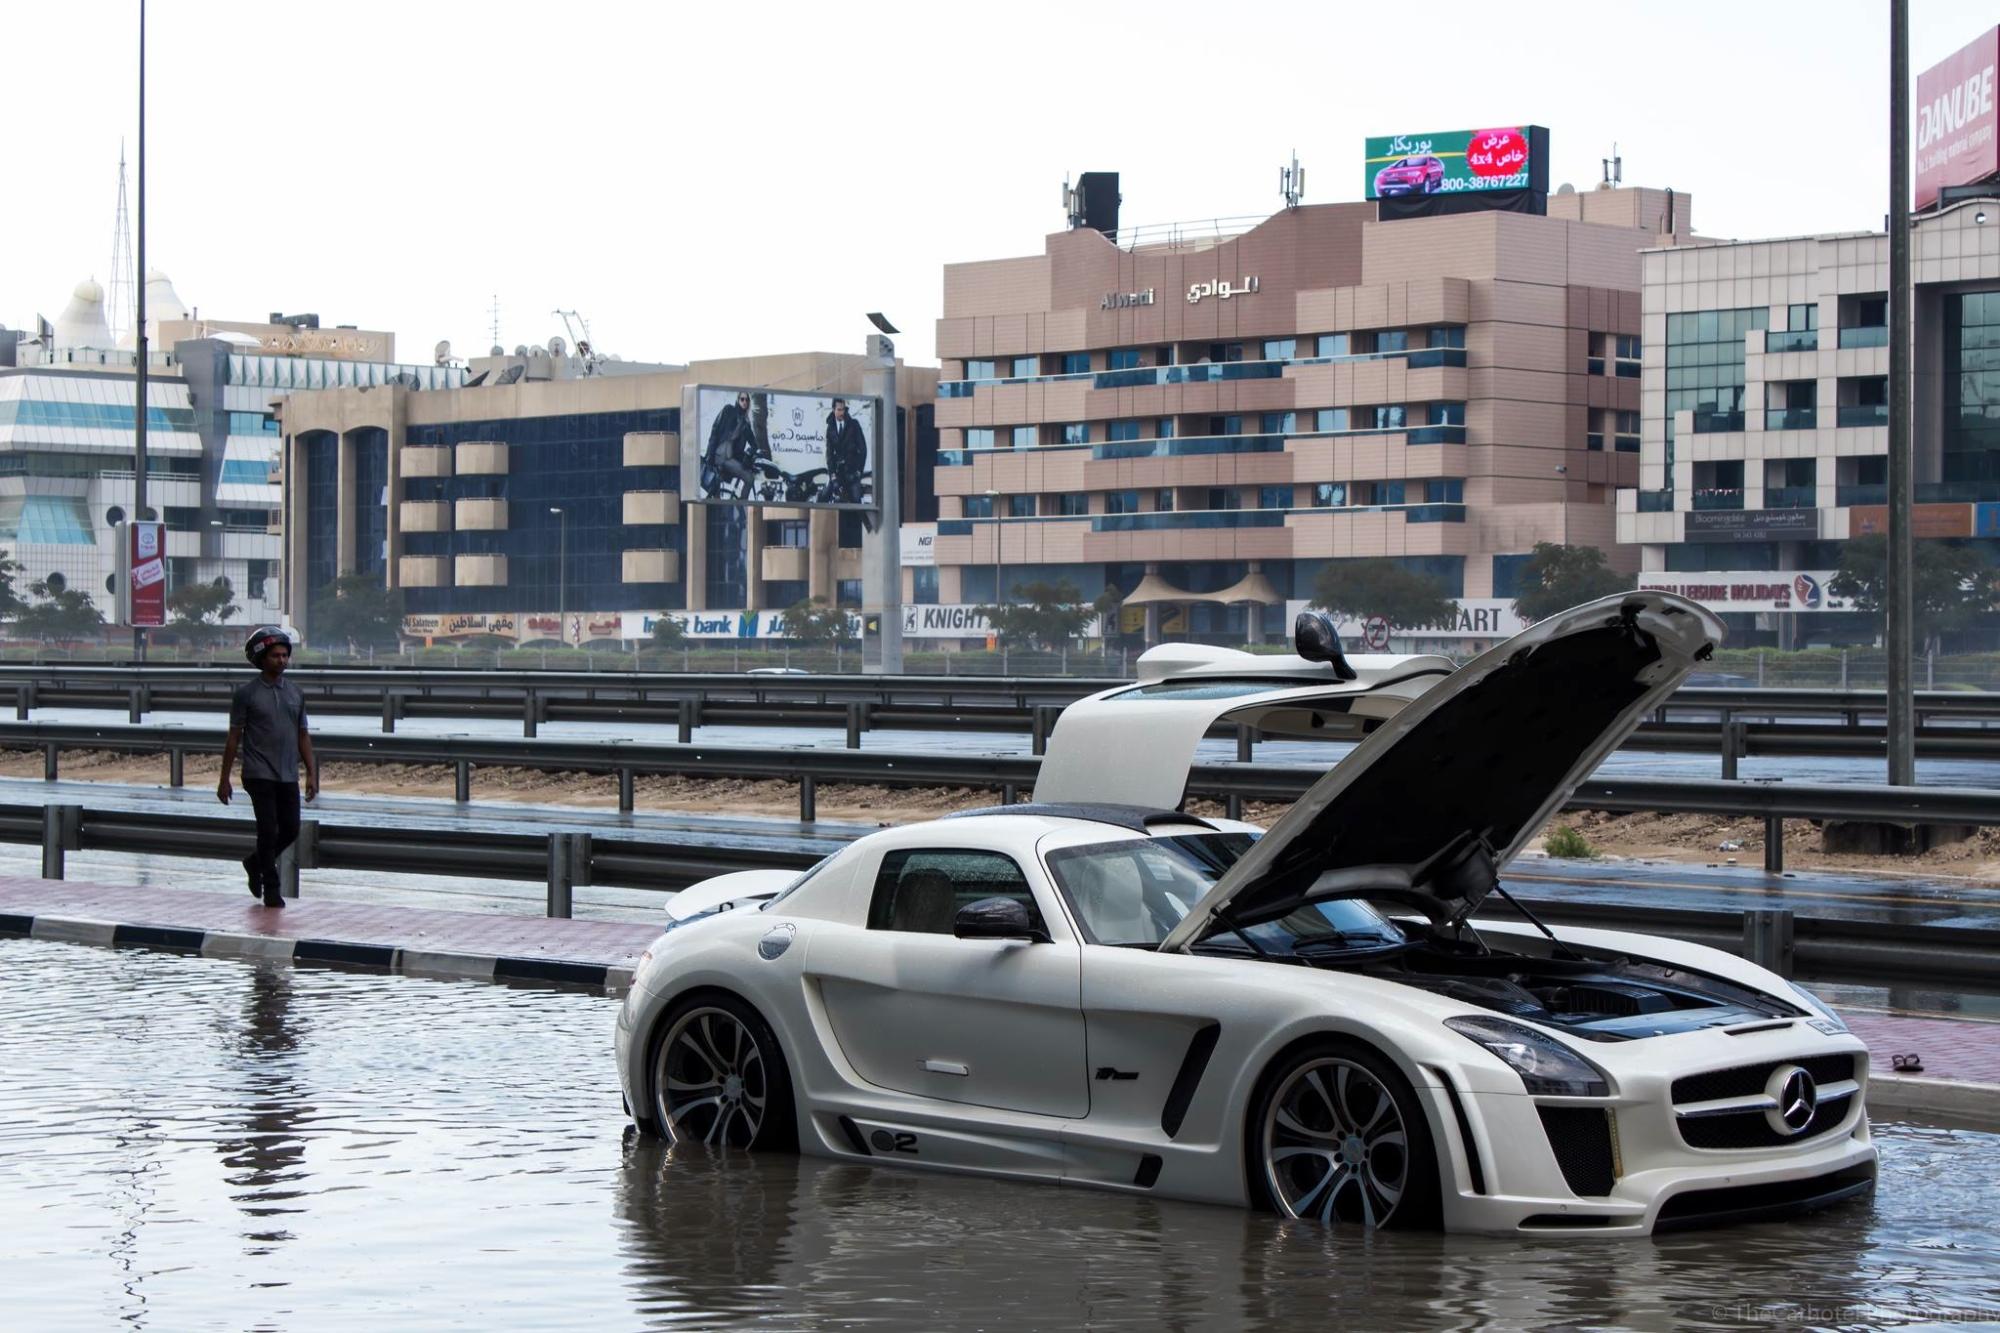 Mercedes Sls Amg Drowns In Puddle Rain In Dubai